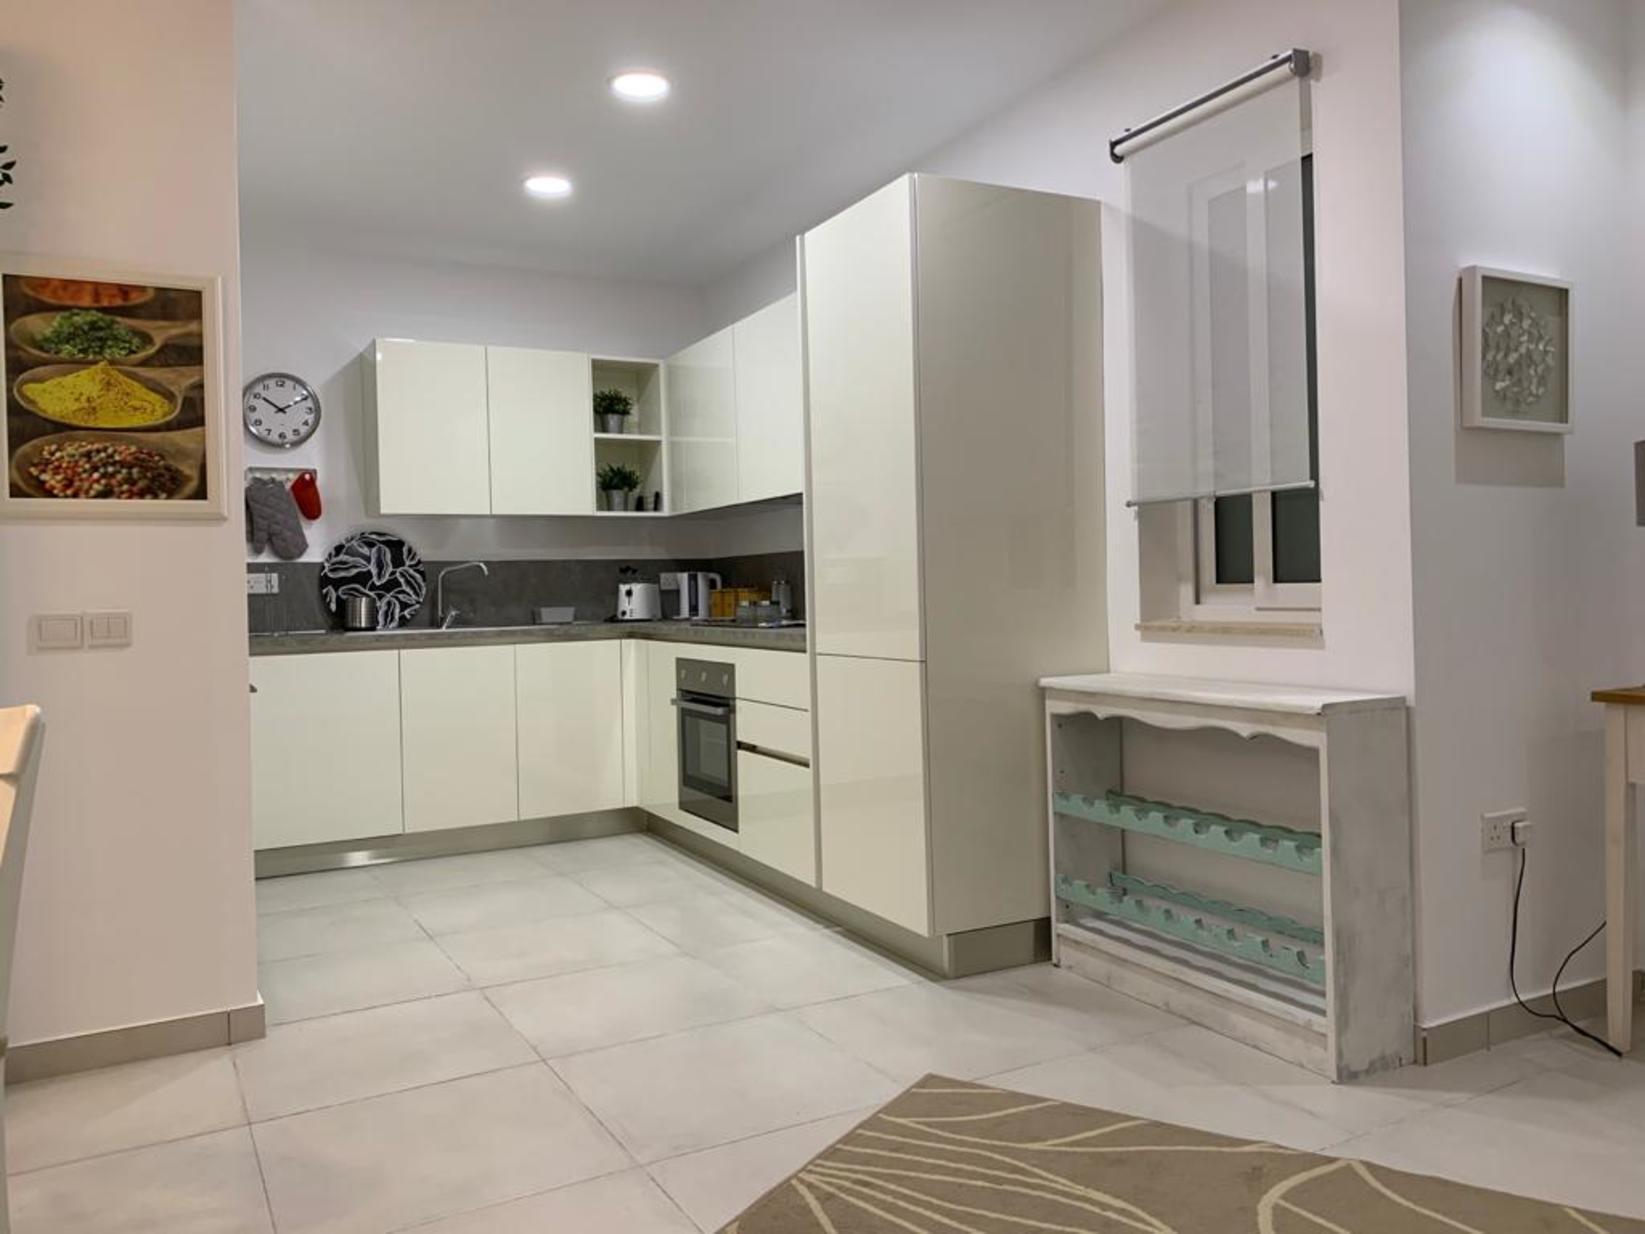 1 bed Apartment For Rent in Sliema, Sliema - thumb 8